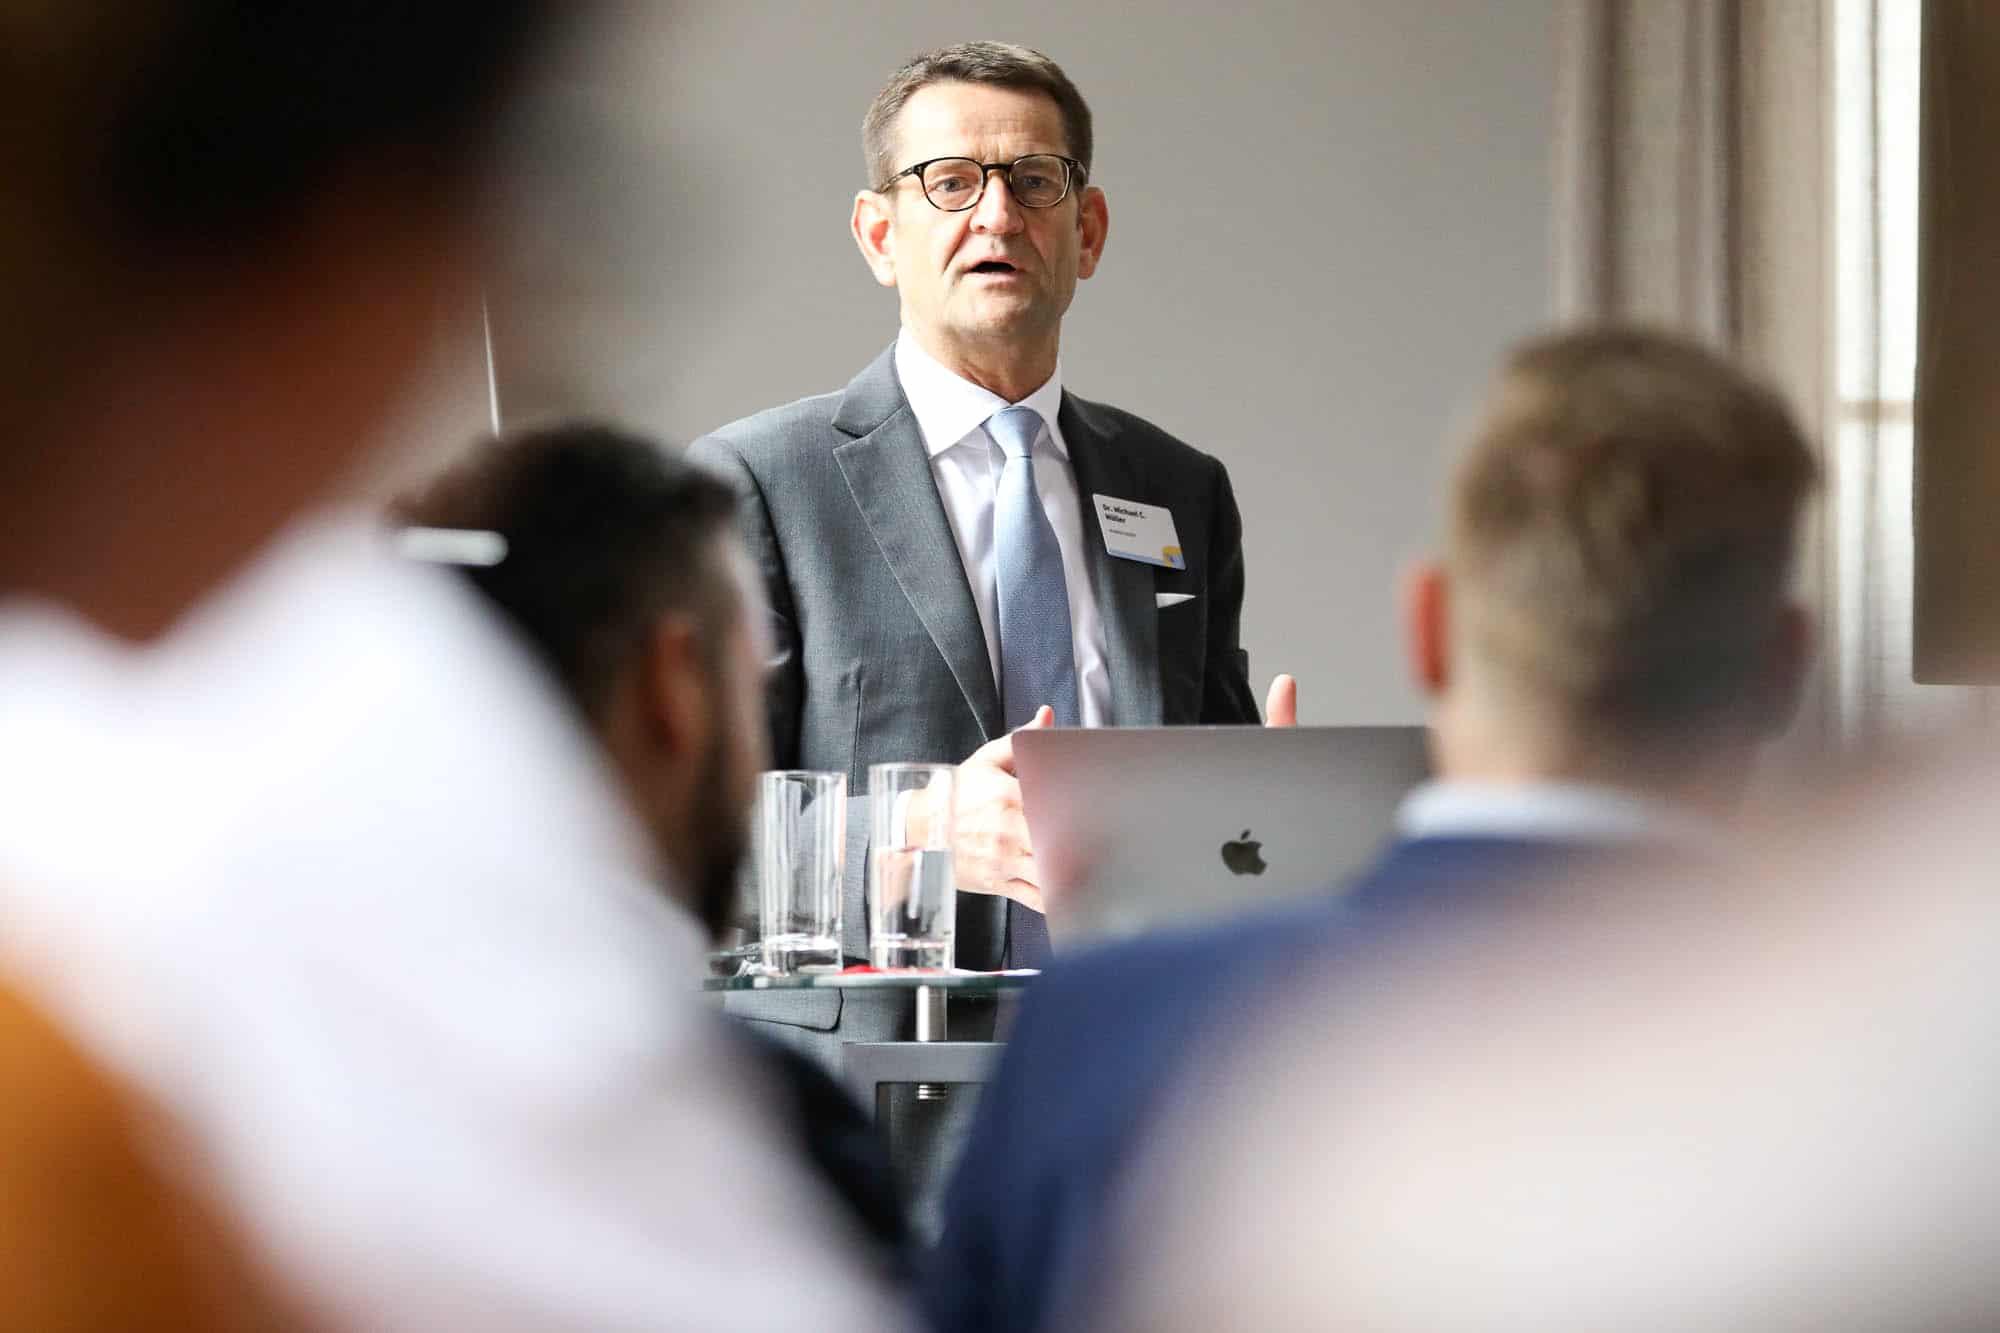 coliquio Summit / Dr. Michael Müller